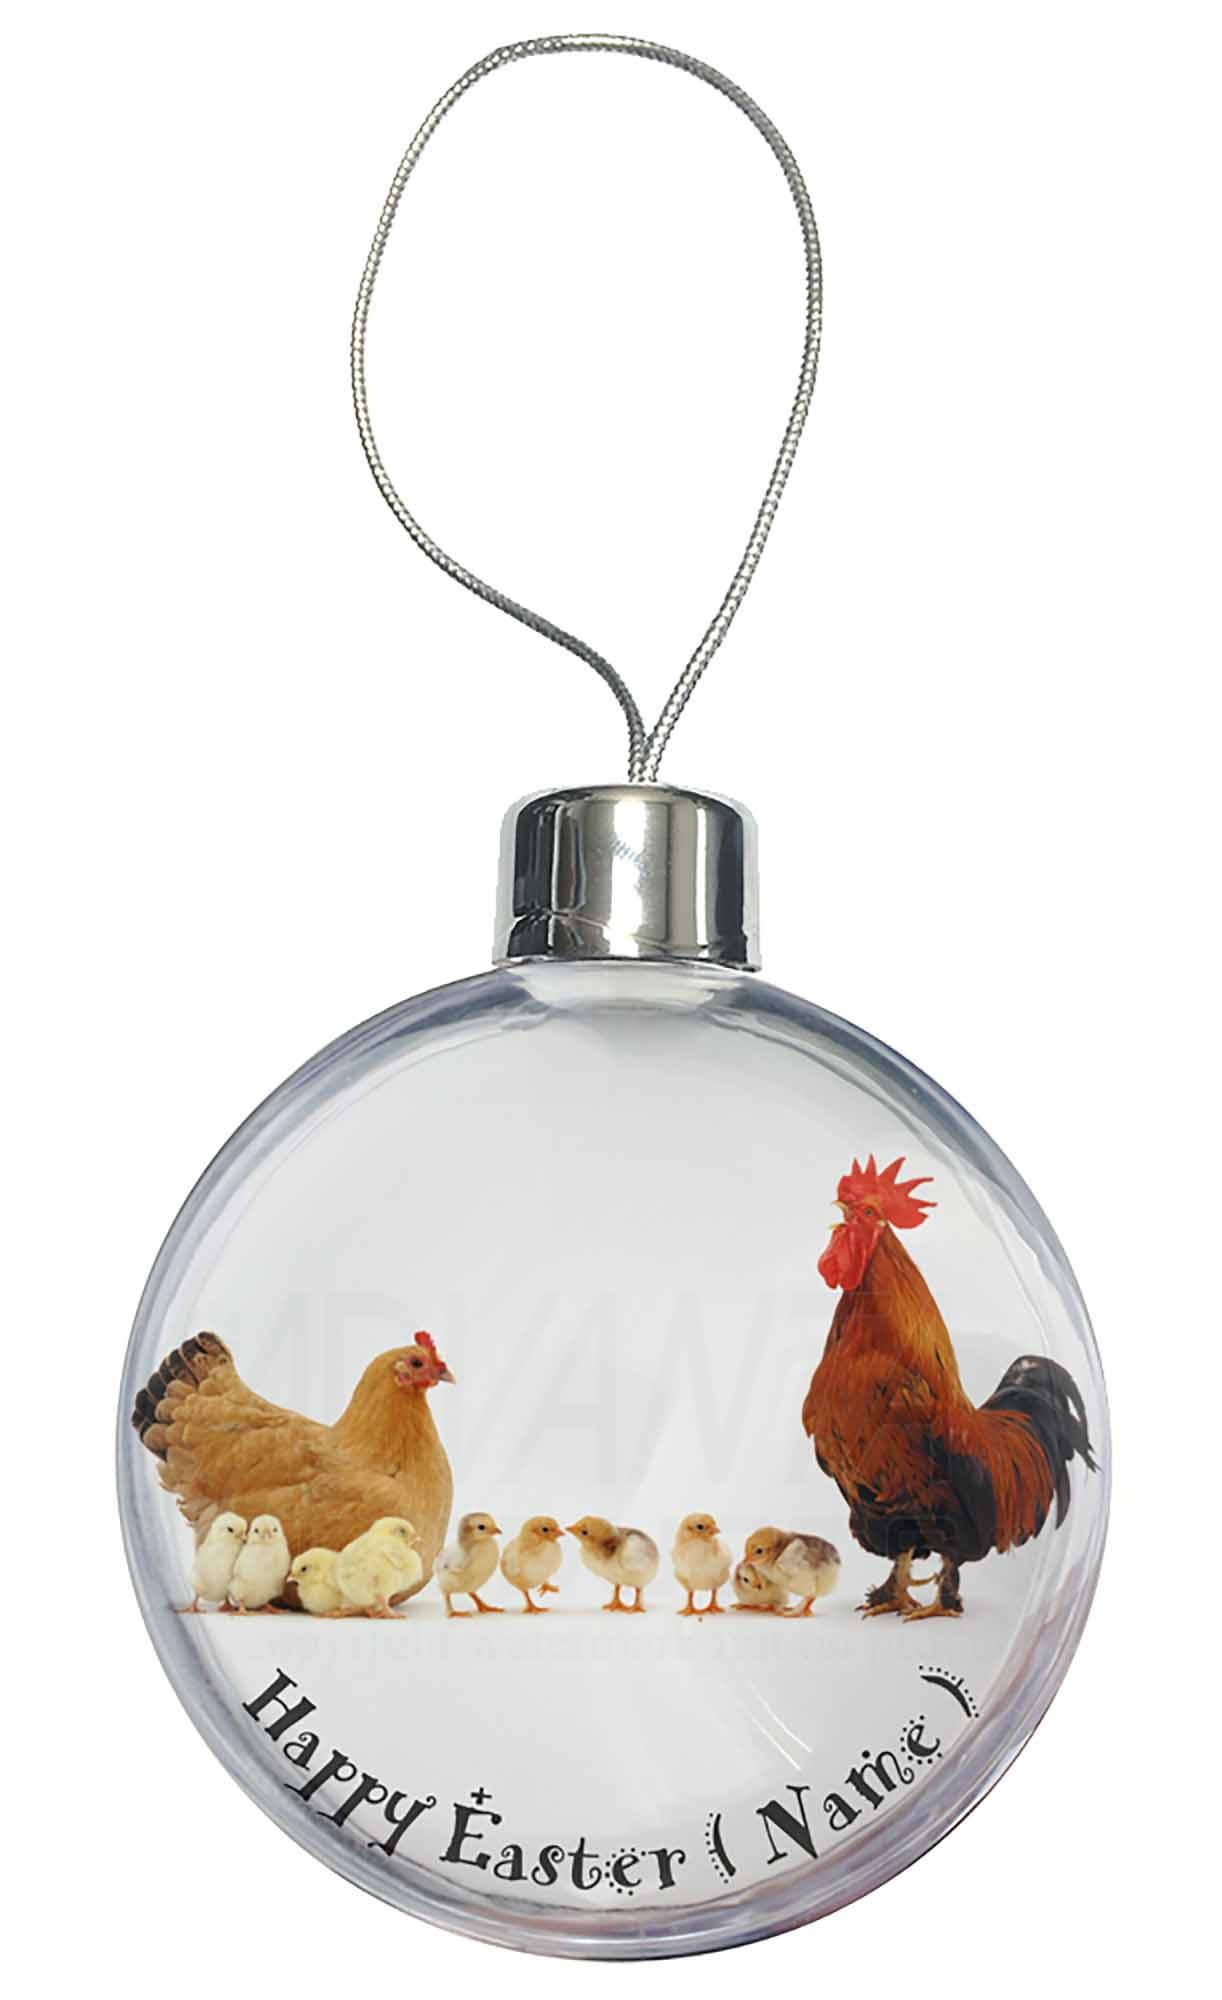 personalisiert junggesellinen hahn chicks christbaumkugeln spielerei ab 107peacb ebay. Black Bedroom Furniture Sets. Home Design Ideas